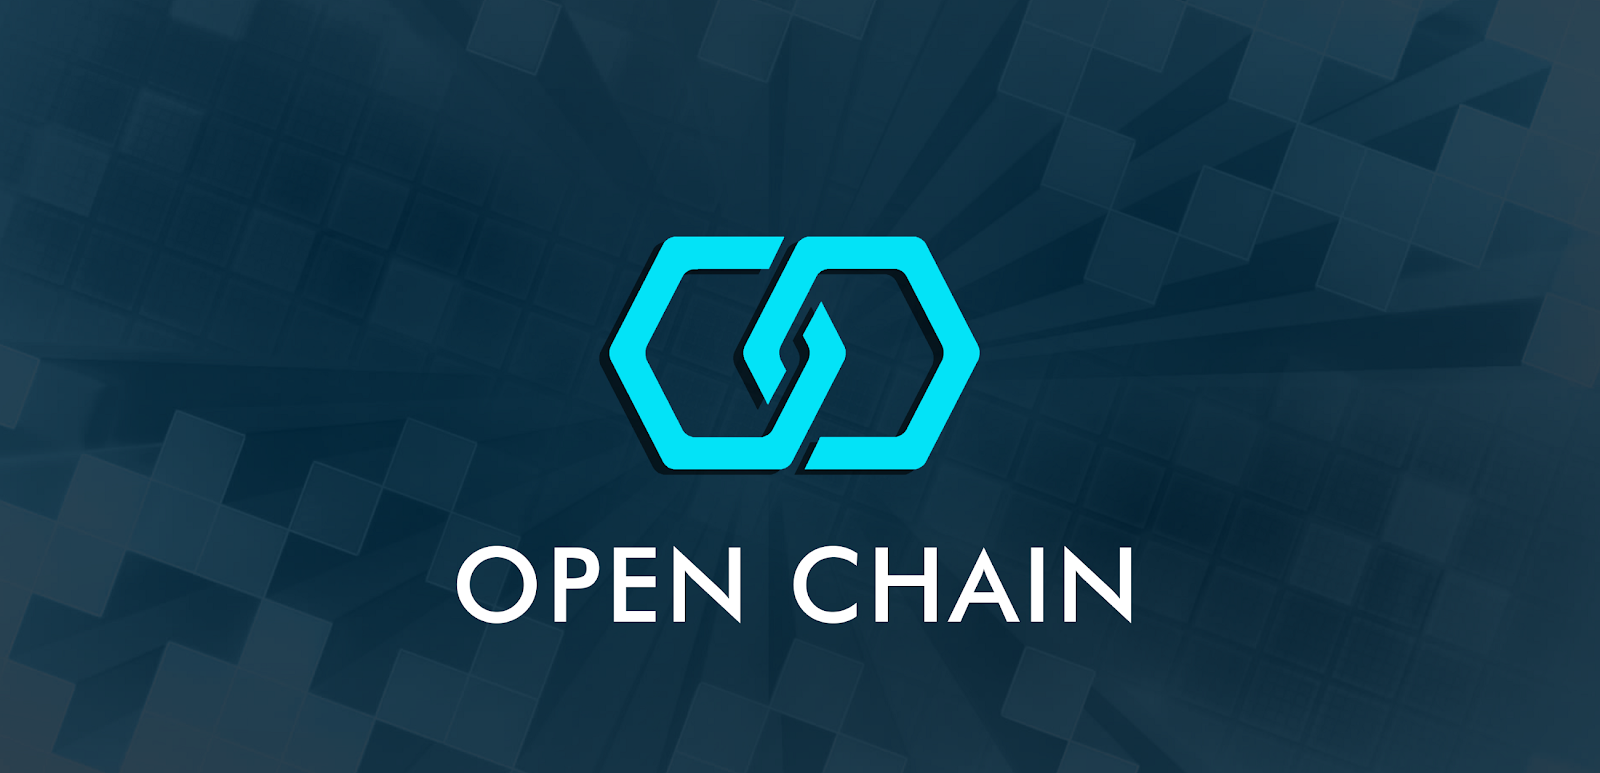 OpenChain logo